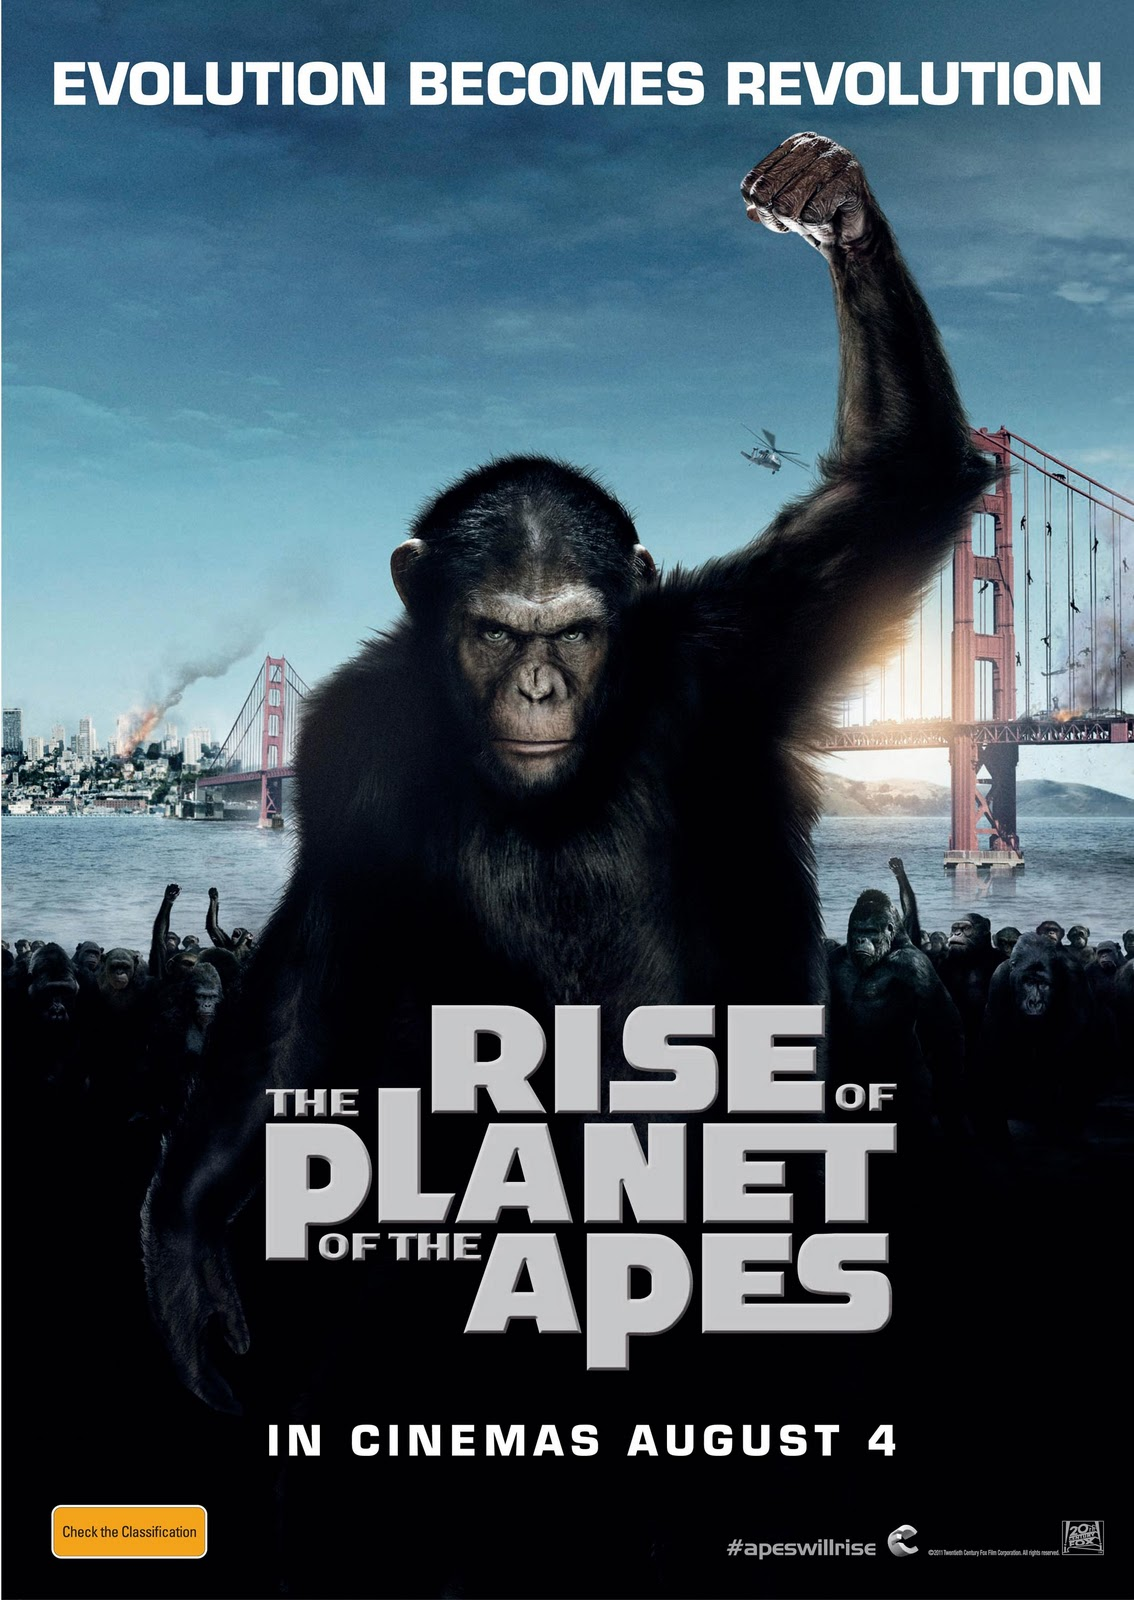 http://3.bp.blogspot.com/-czzcQzRn6Kc/TnTZaCXOpMI/AAAAAAAAEVE/HoaZ7Ck2q_Y/s1600/Rise-of-the-Planet-of-the-Apes-poster.jpg